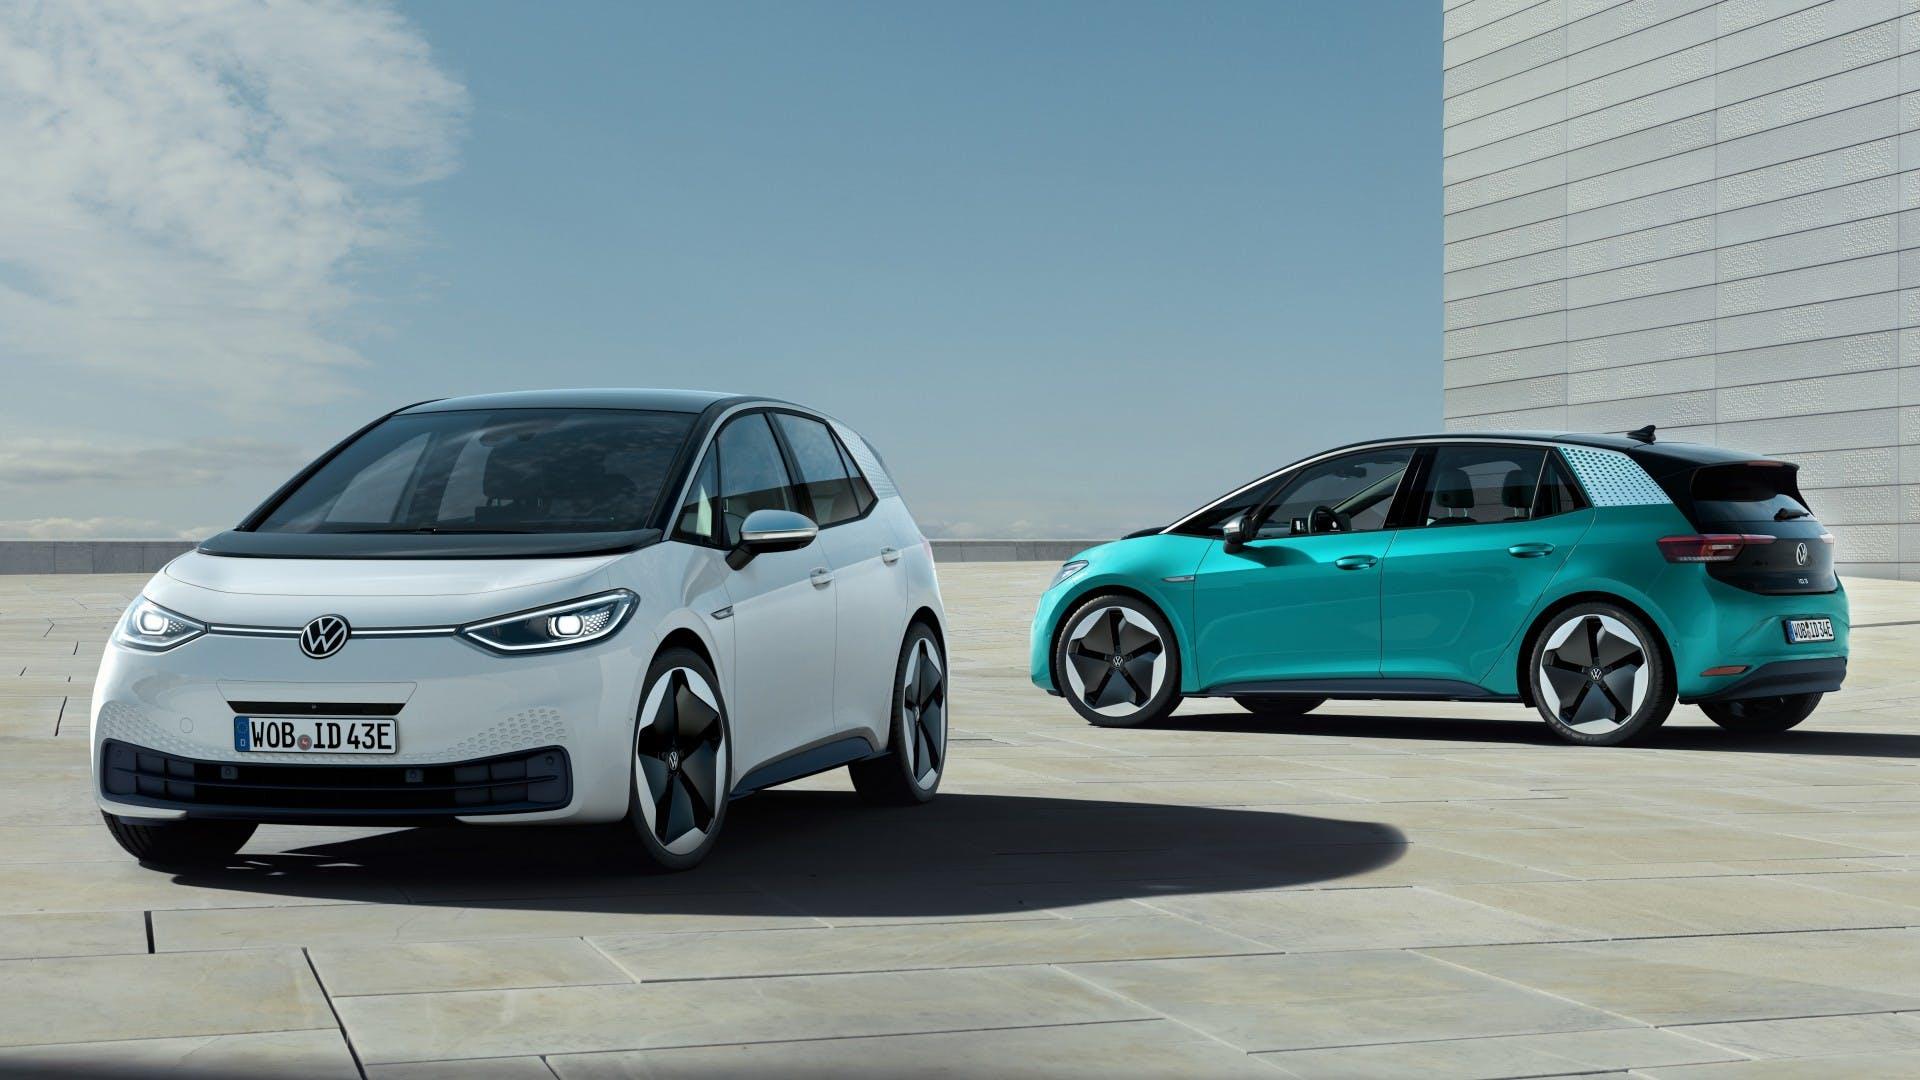 Volkswagen id3, VW id3, elektrische wagen